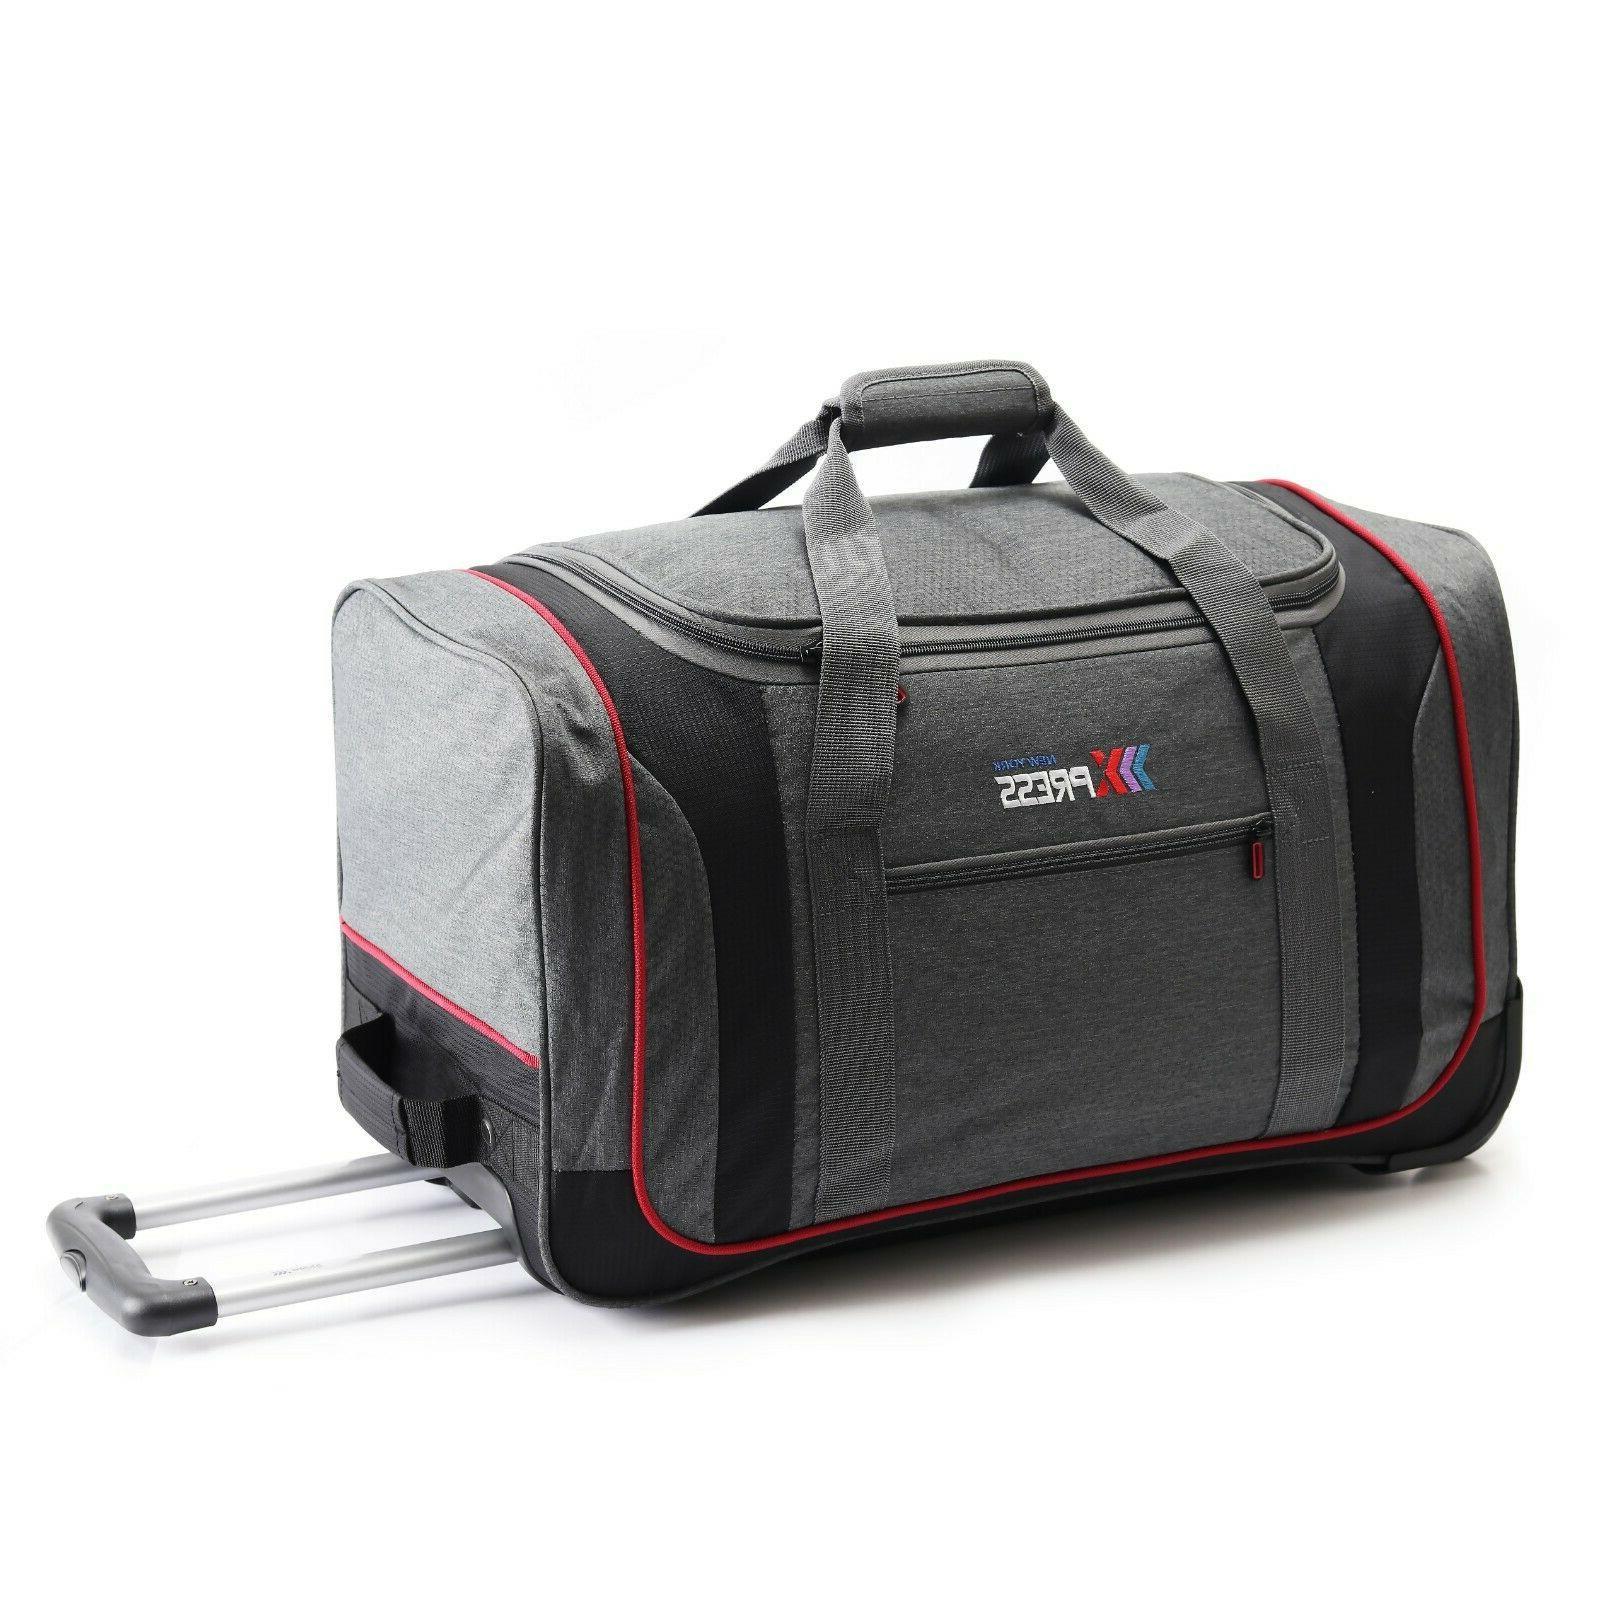 22 Travel Suitcase